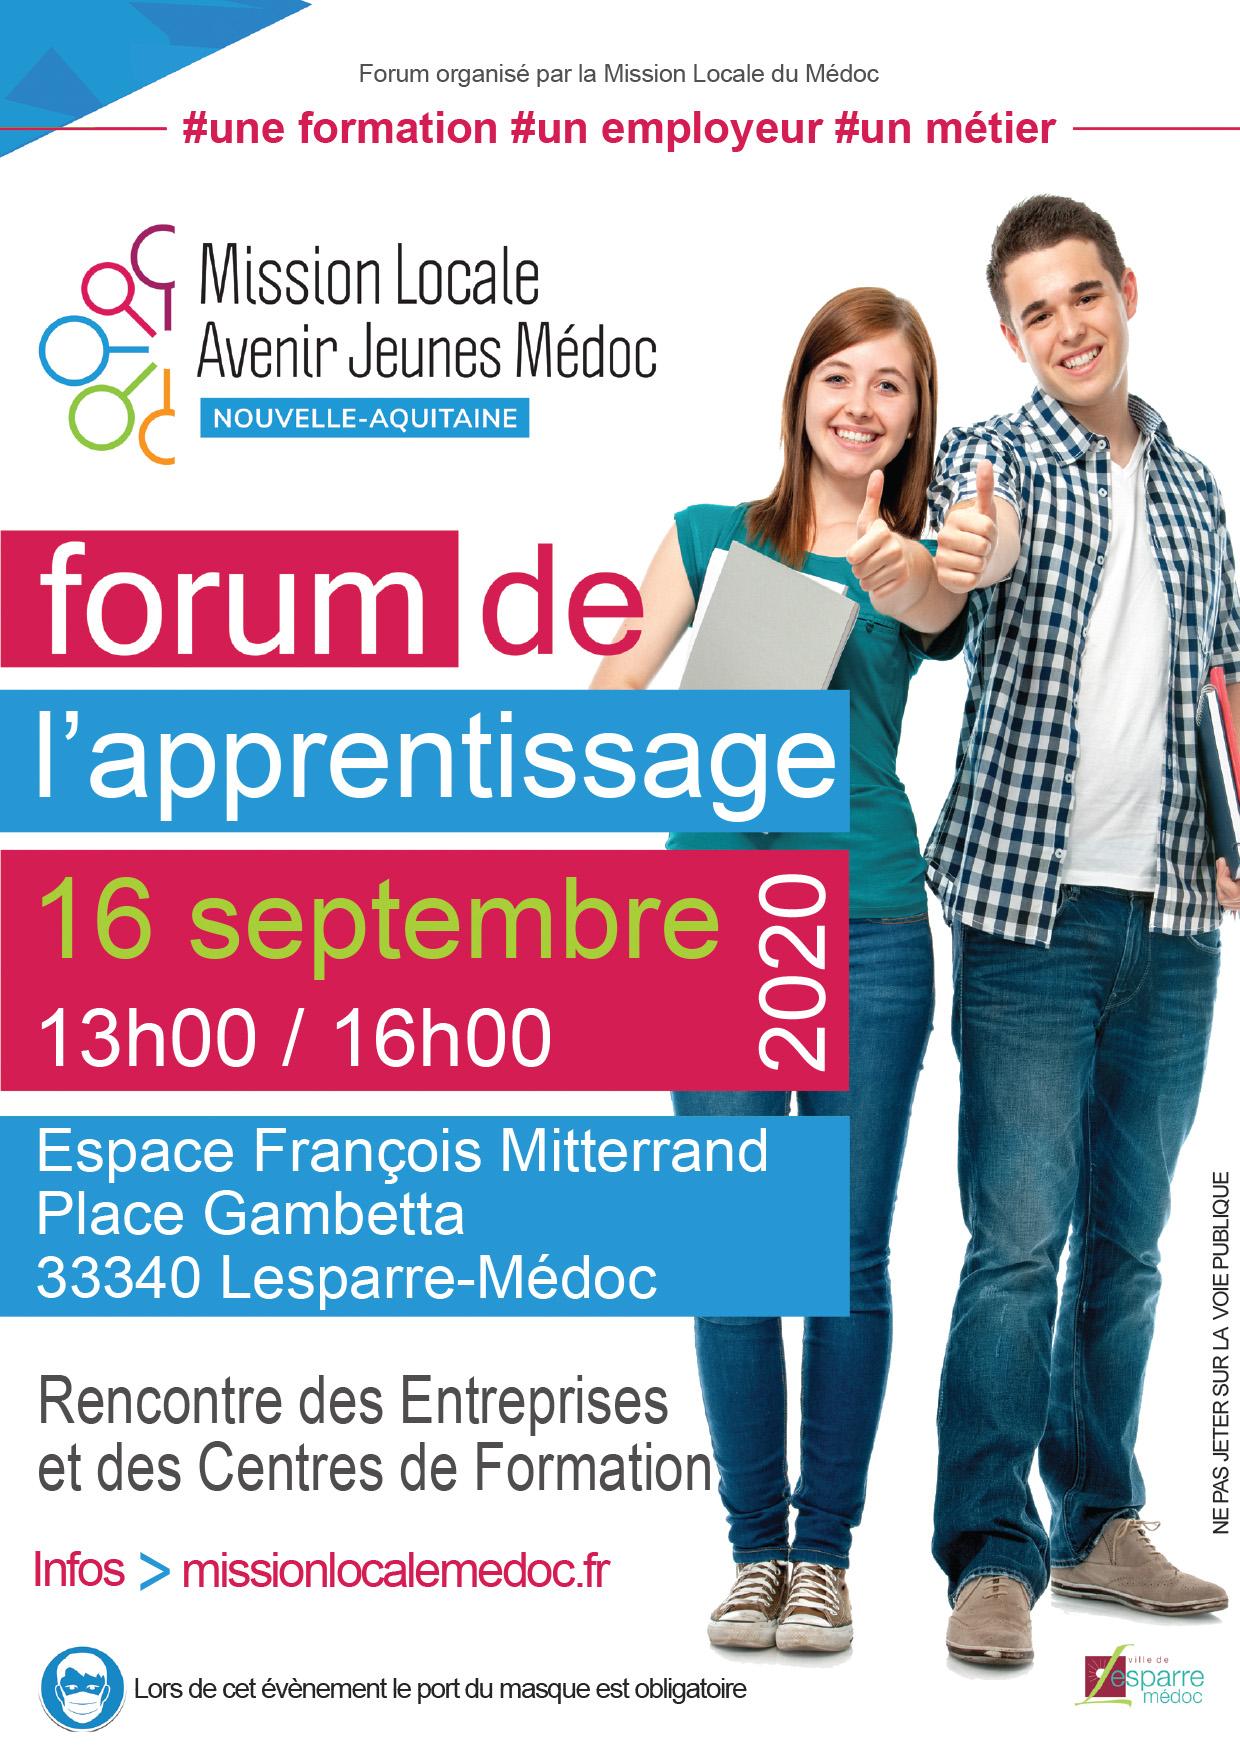 Forum de l'apprentissage 2020 - Mission locale